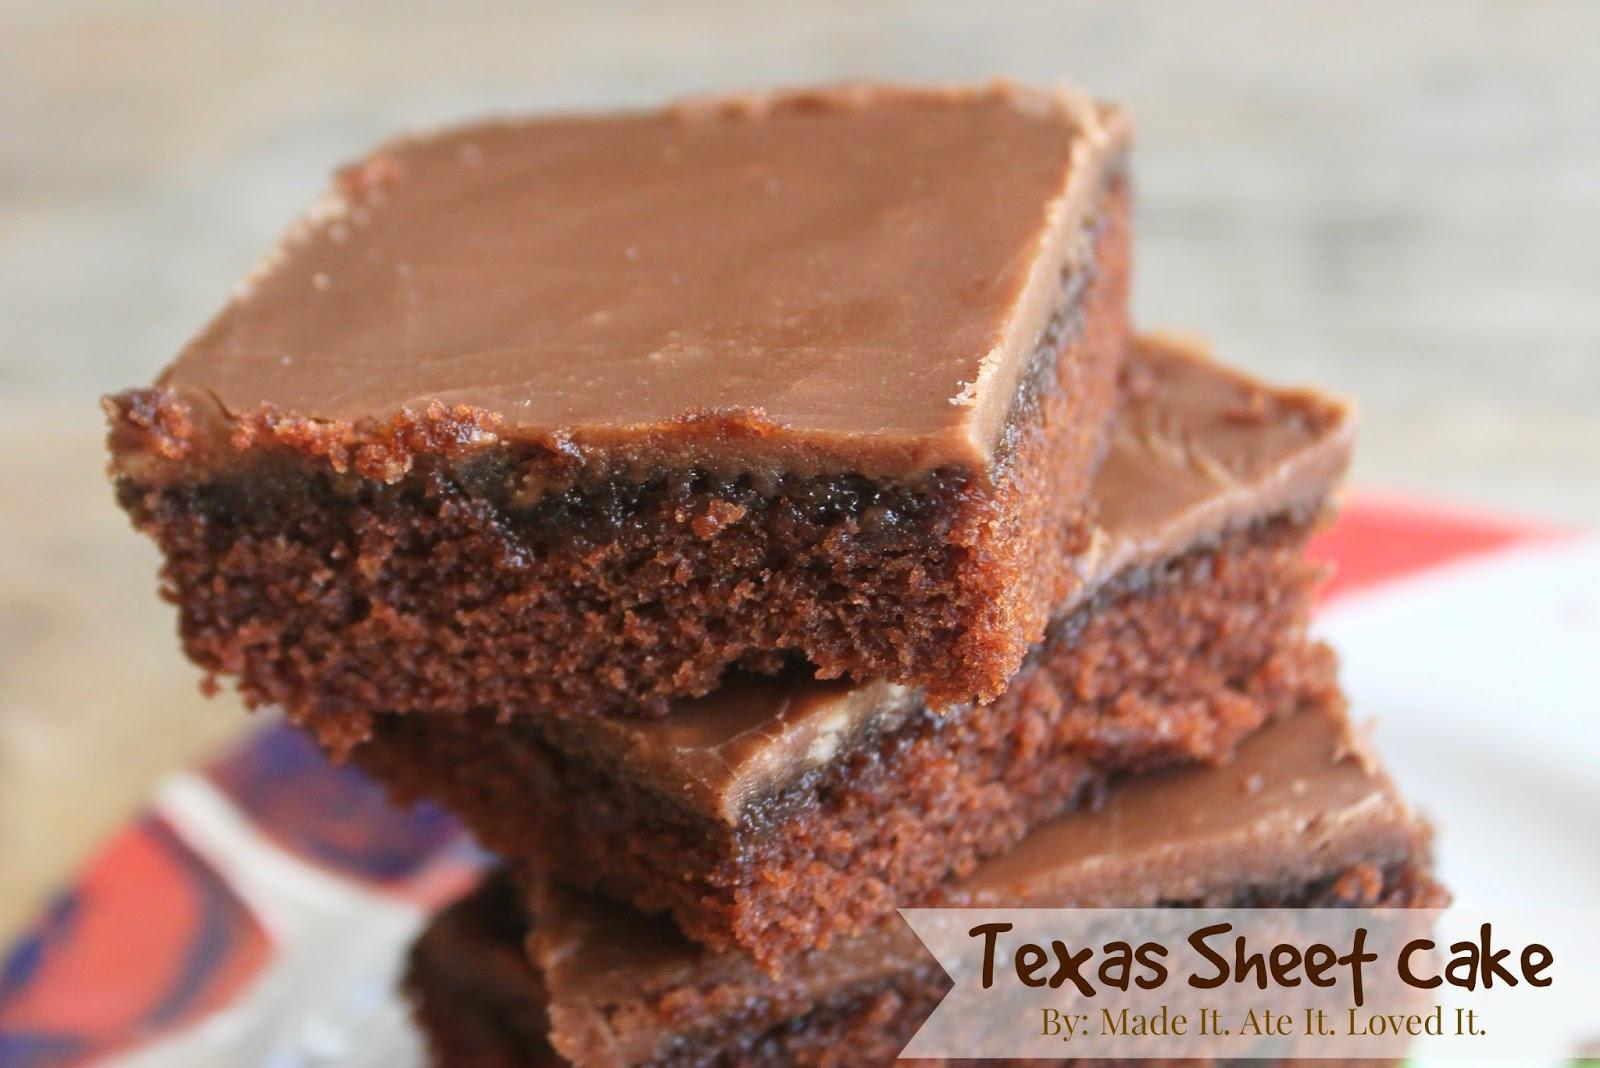 Texas Sheet Cake Brownies  Made It Ate It Loved It Texas Sheet Cake